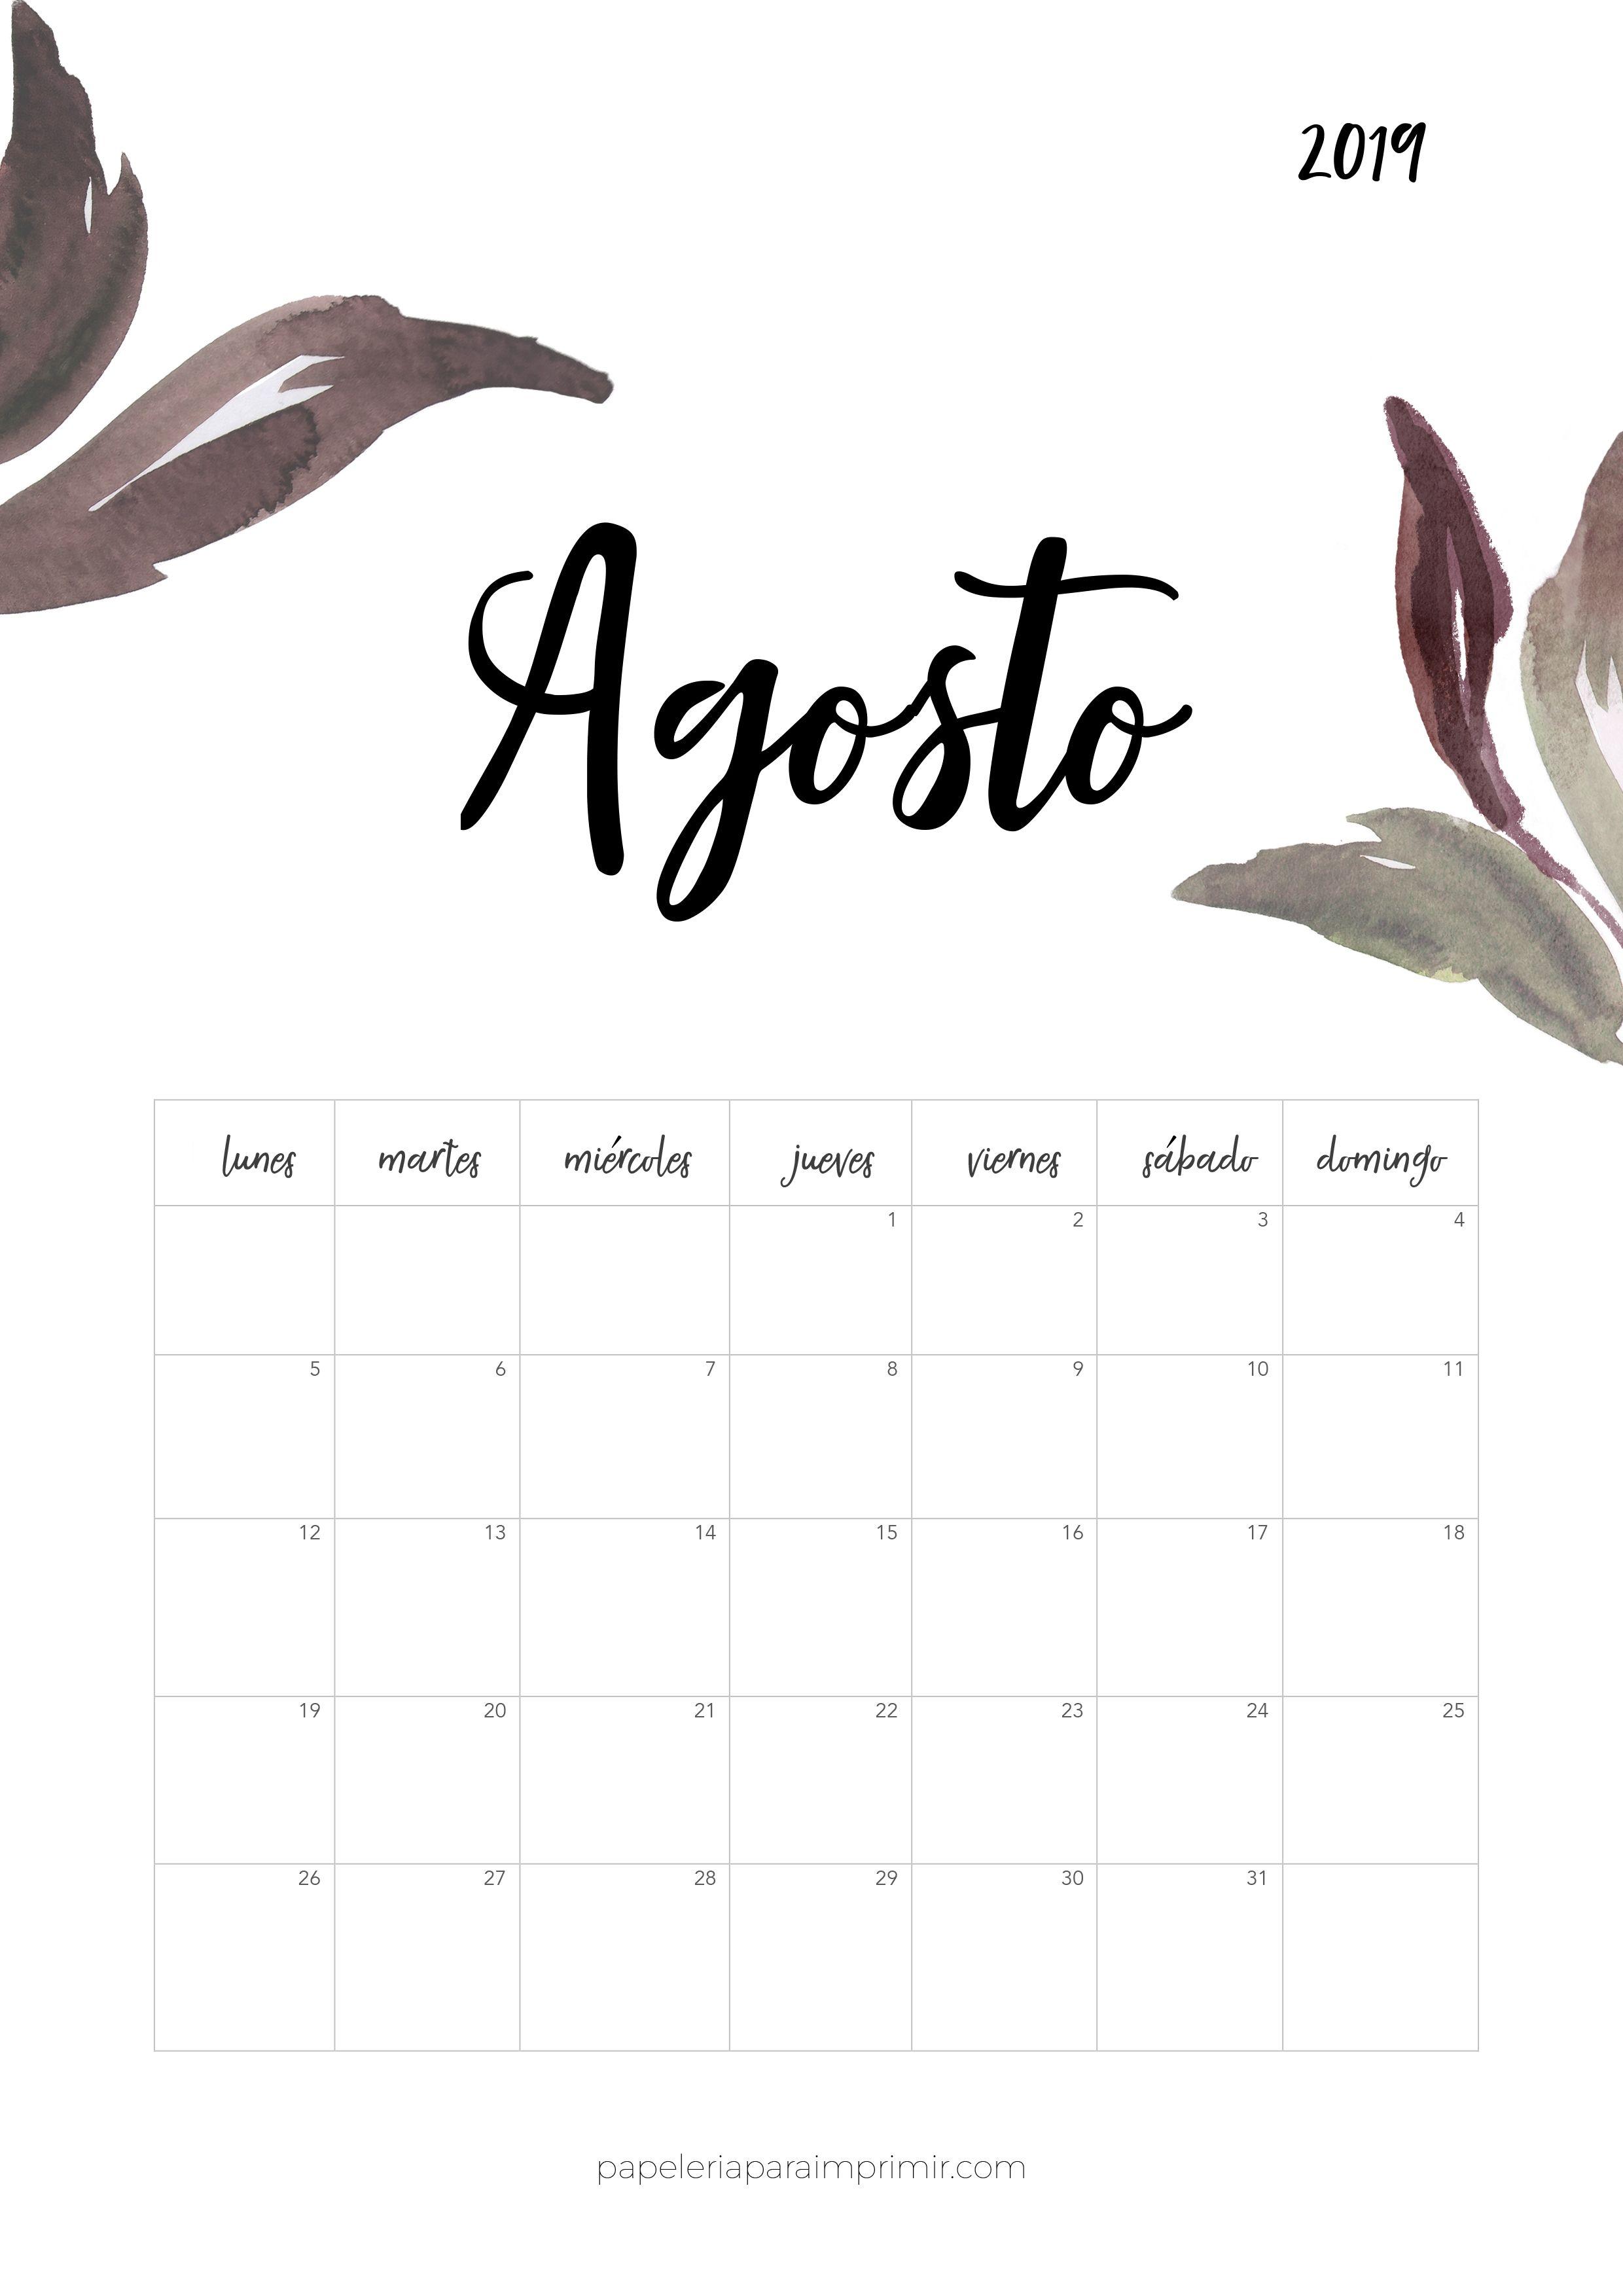 Calendario Agosto 2020 Para Imprimir Gratis.Calendario Para Imprimir 2019 Agosto Calendario Calendar